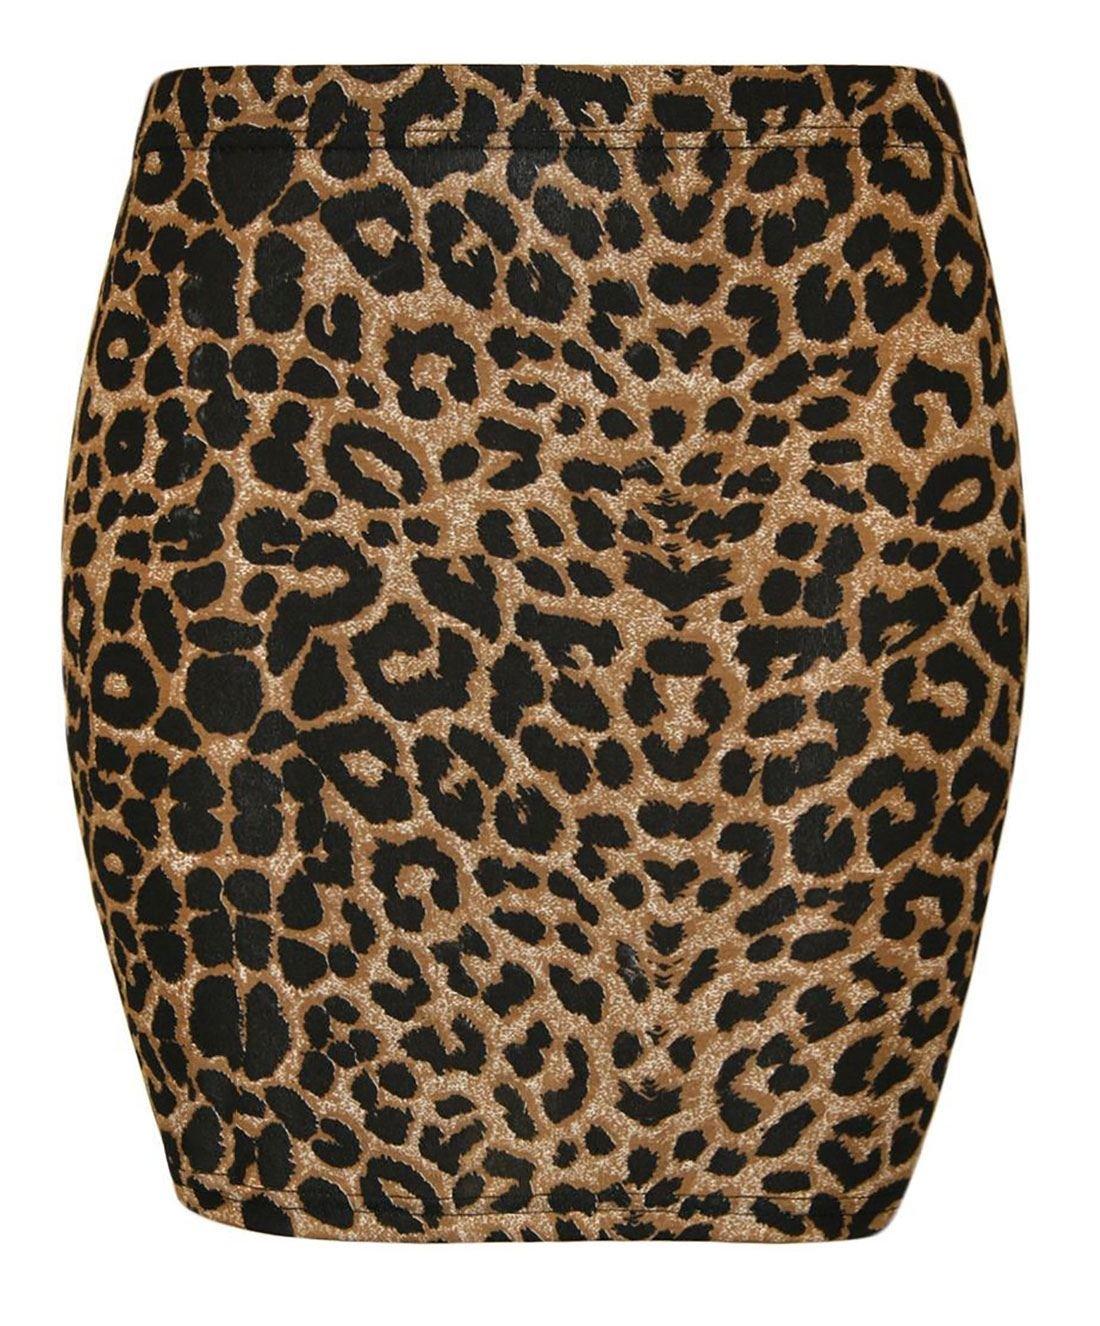 Rimi Hanger Ladies Printed Jersey Mini Skirt Bodycon S/XXXL